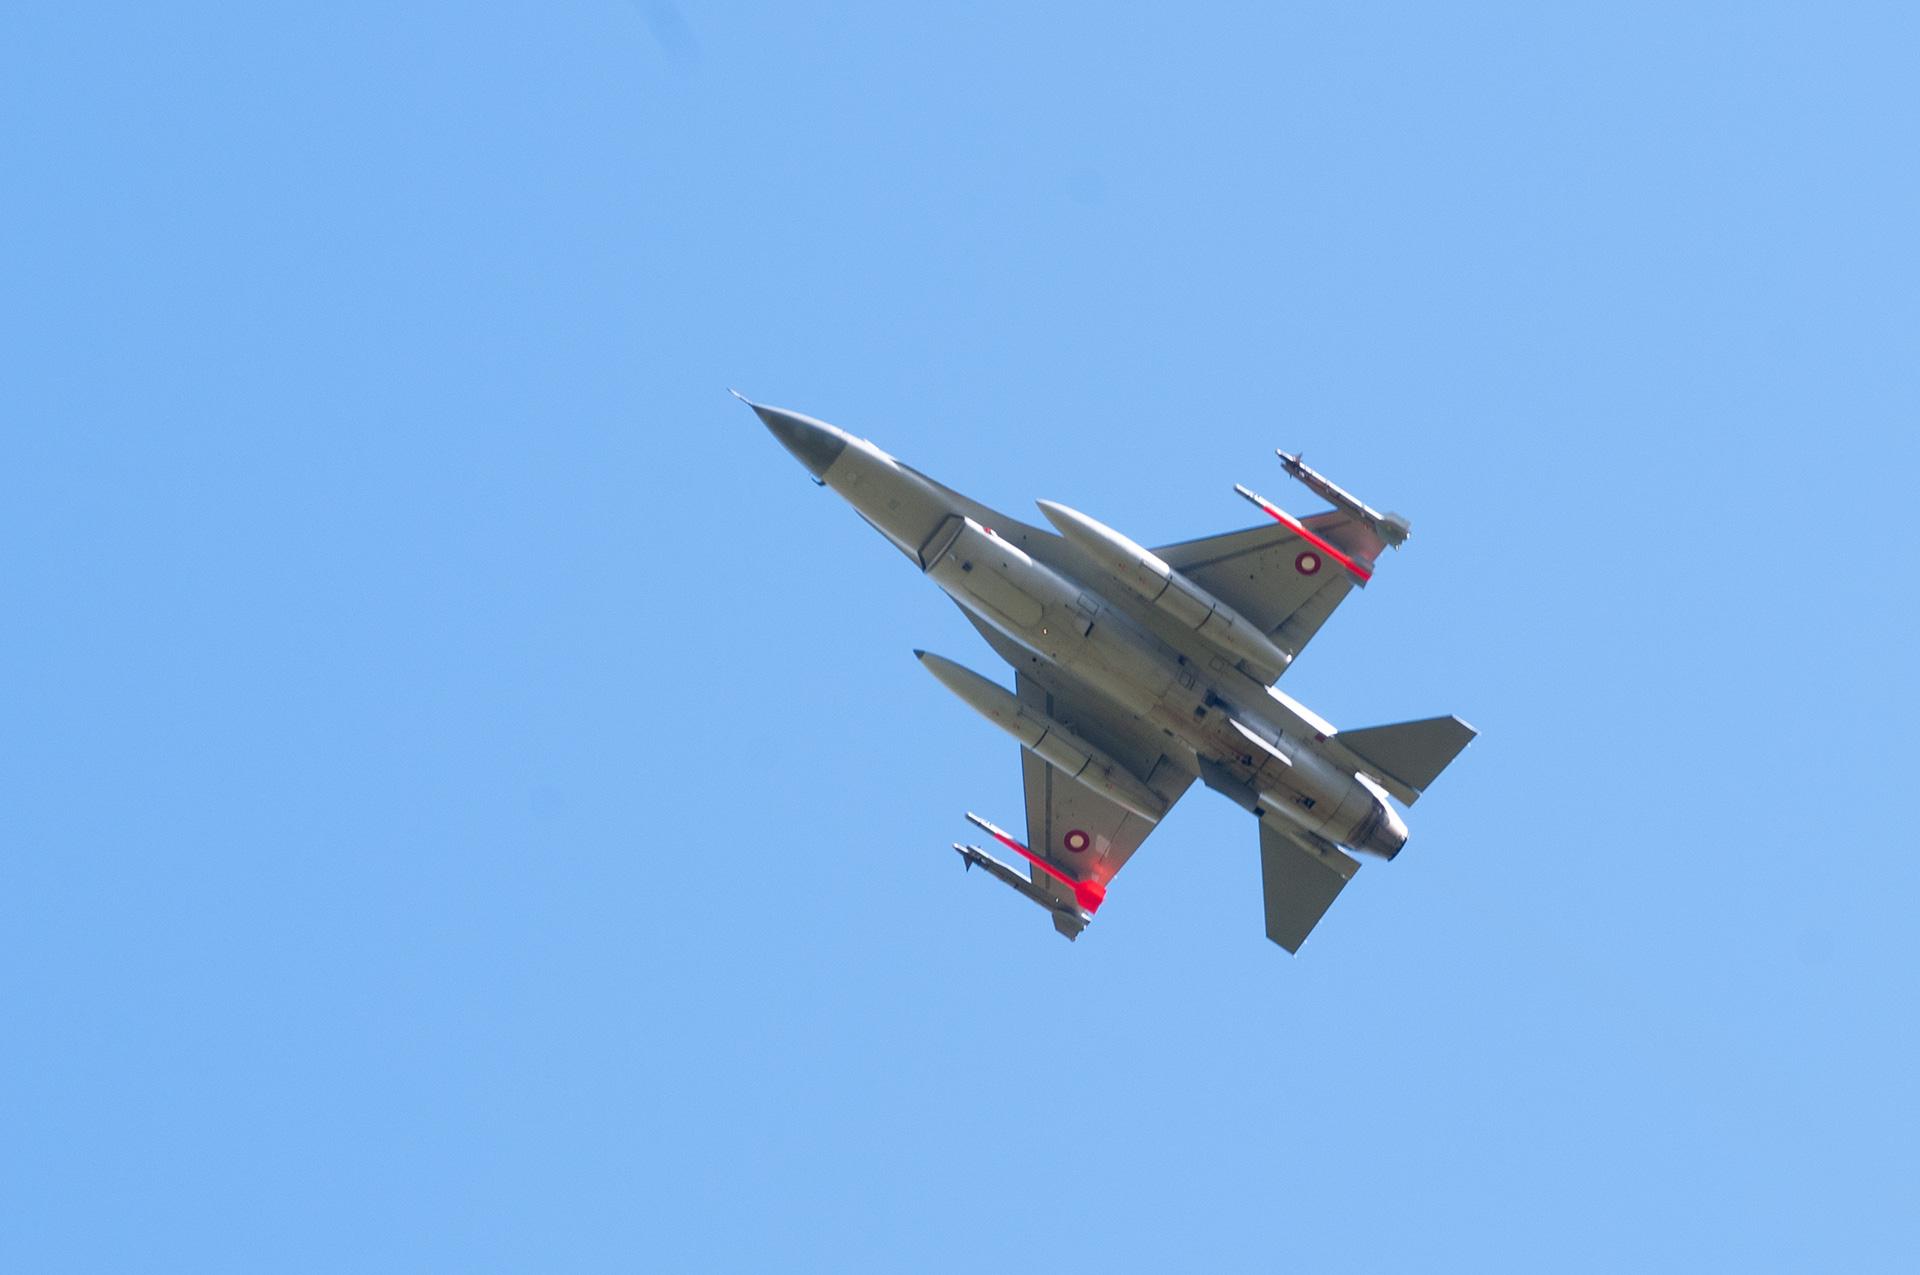 F16 Foto: René Holm